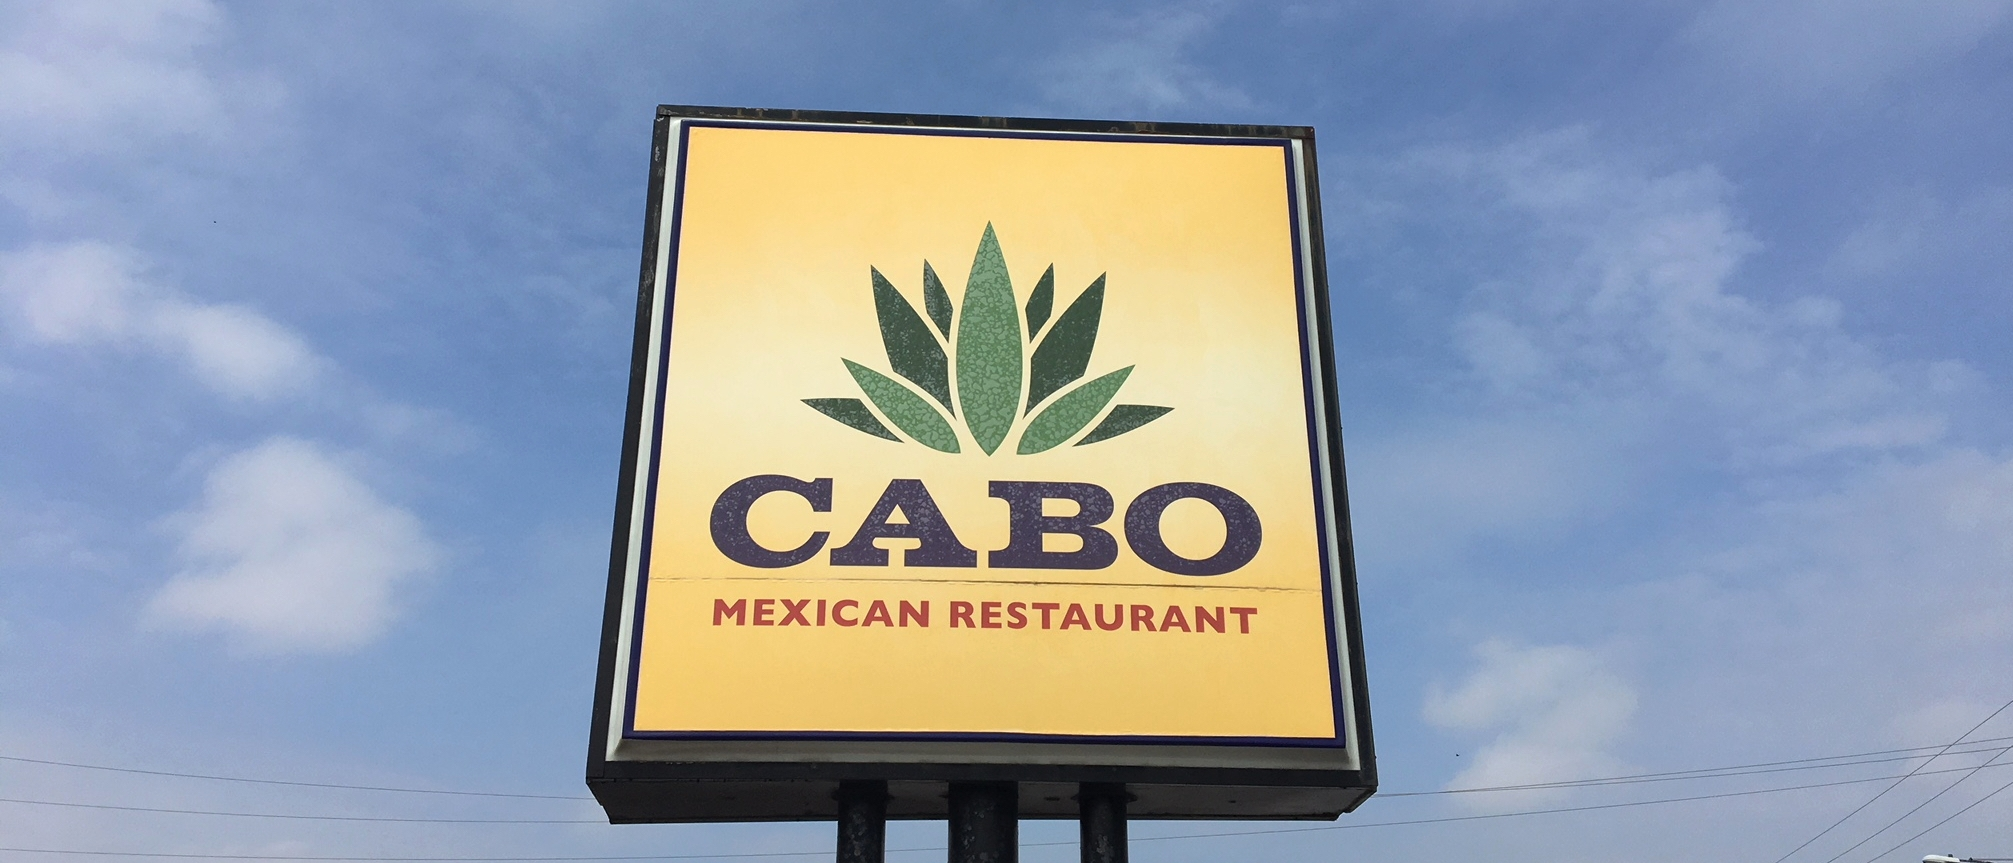 Cabo2.jpg